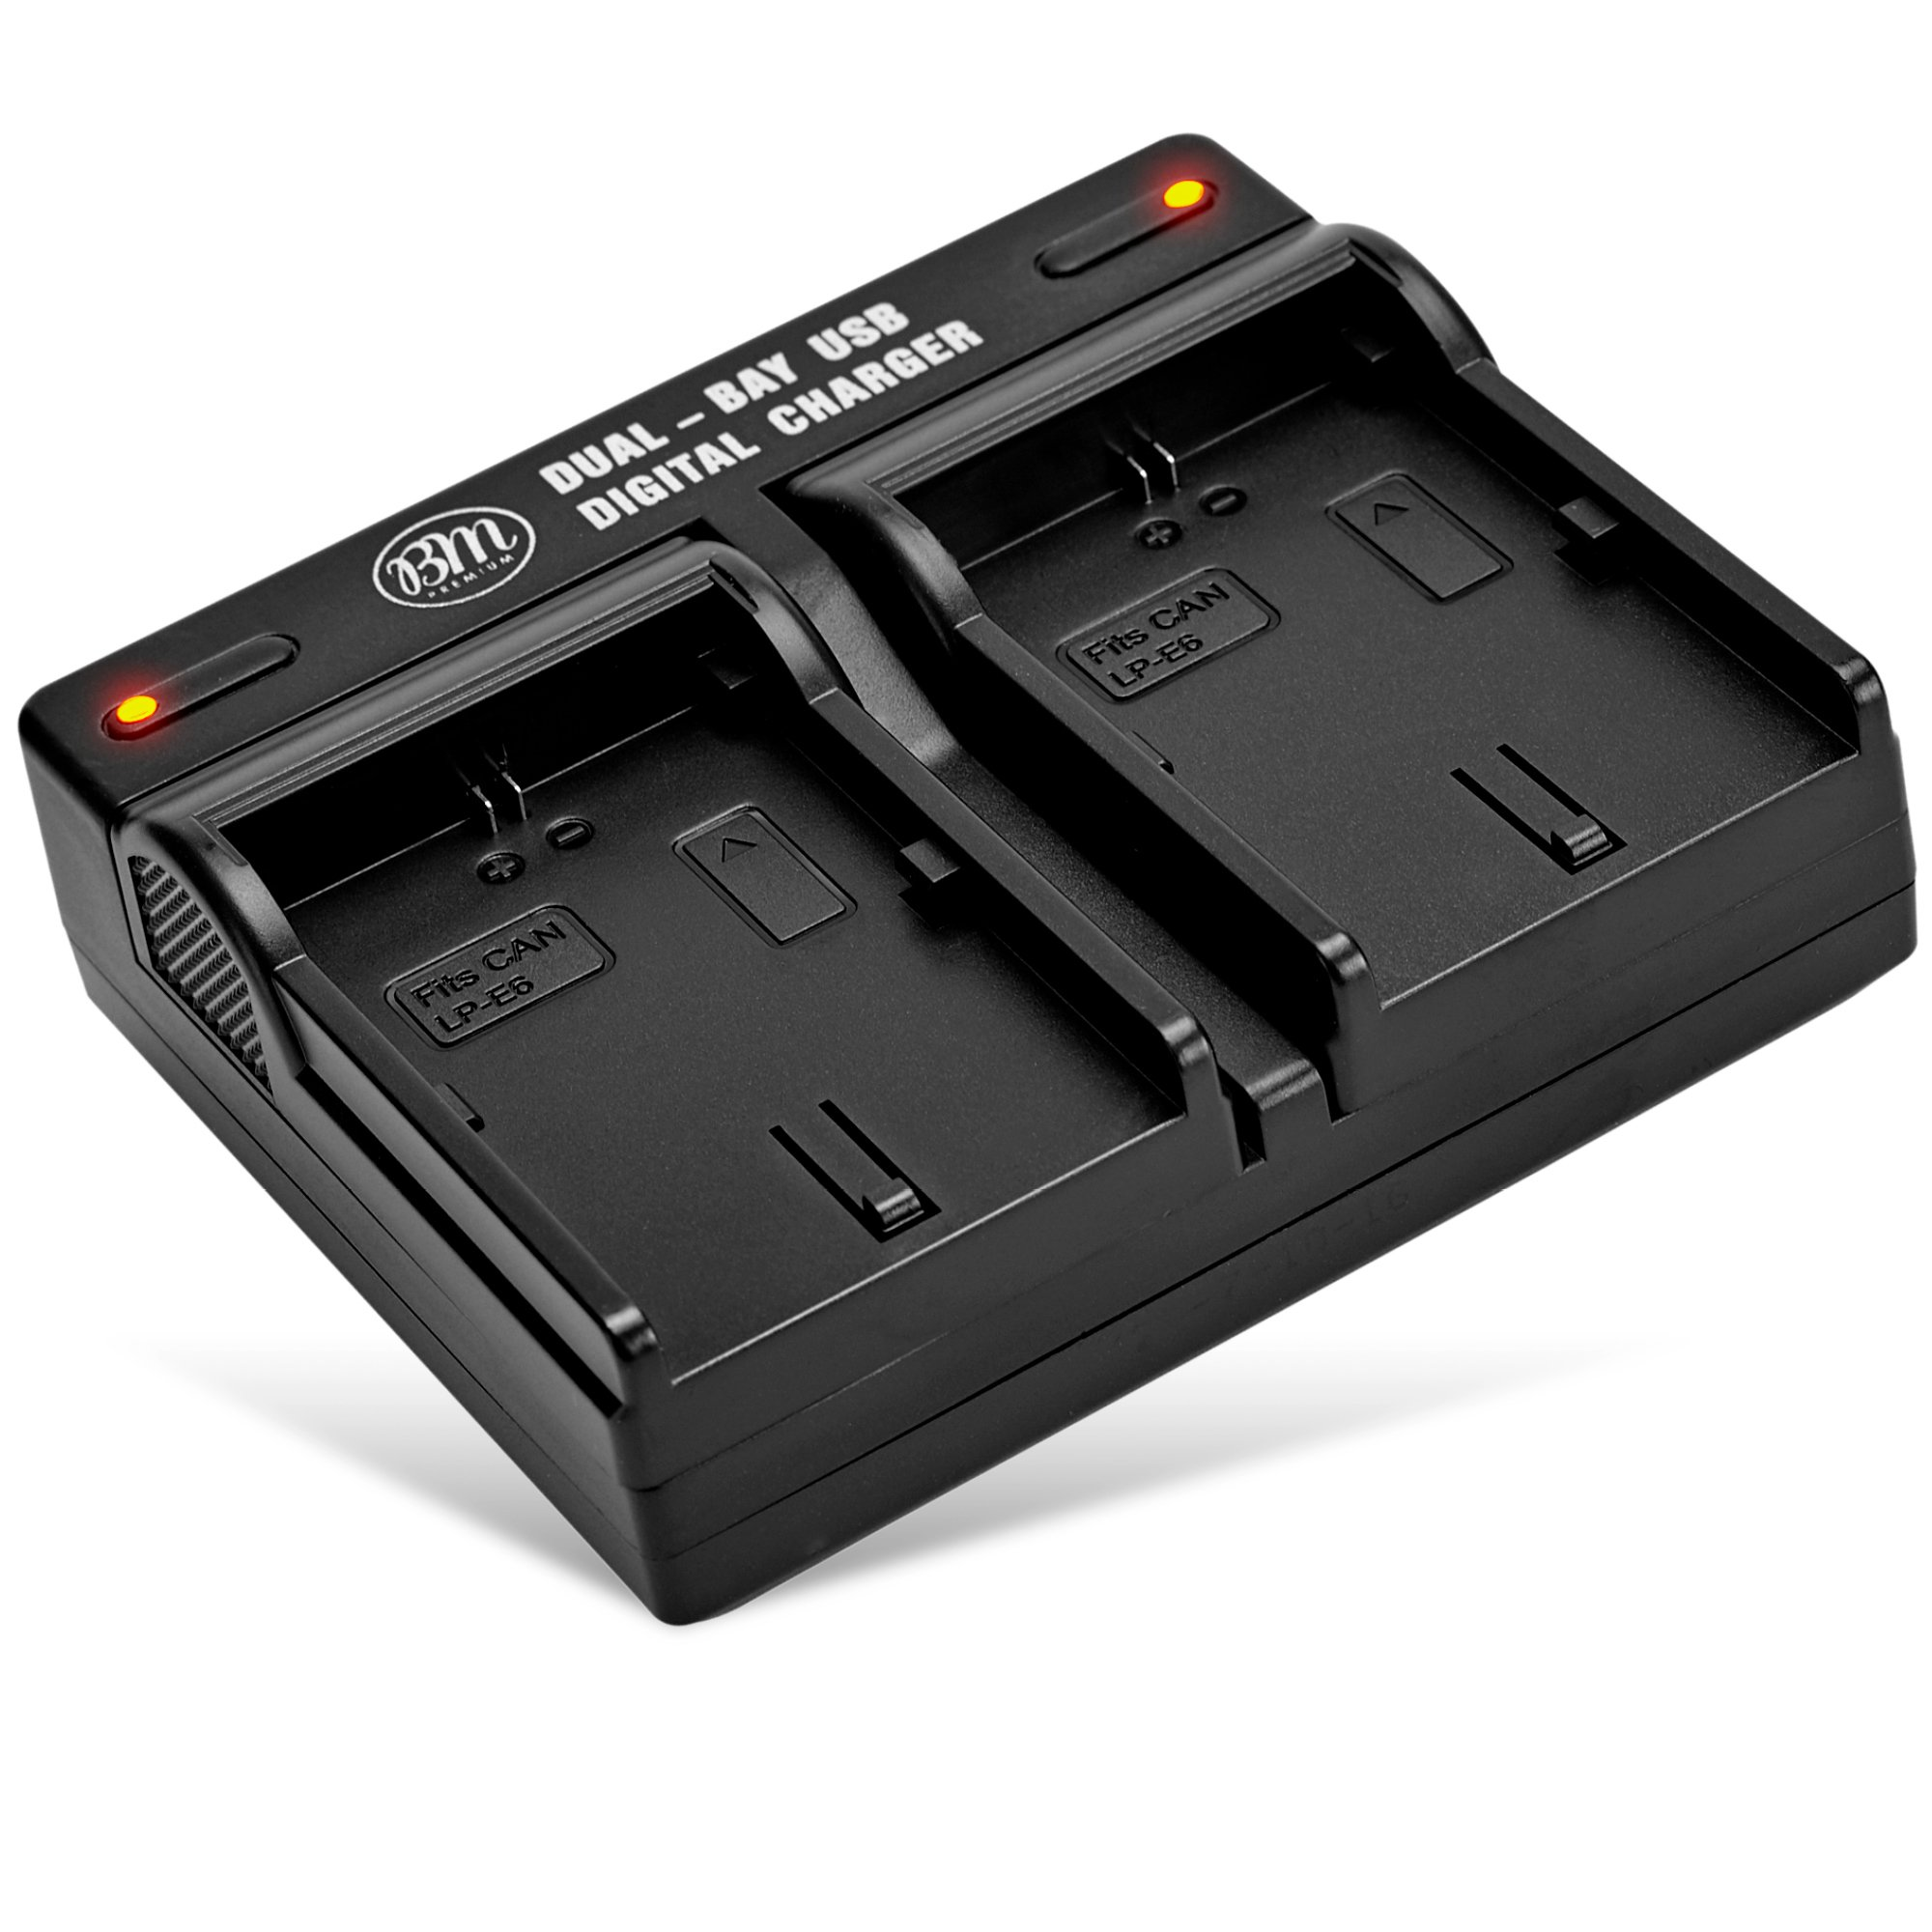 BM LP-E6, LP-E6N Dual Bay Battery Charger for Canon EOS R, EOS 90D, EOS 60D, EOS 70D, EOS 80D, EOS 5D II, EOS 5D III, EOS 5D IV, EOS 5Ds, EOS 6D, EOS 6D II, EOS 7D, EOS 7D II, C700, XC10, XC15 Cameras